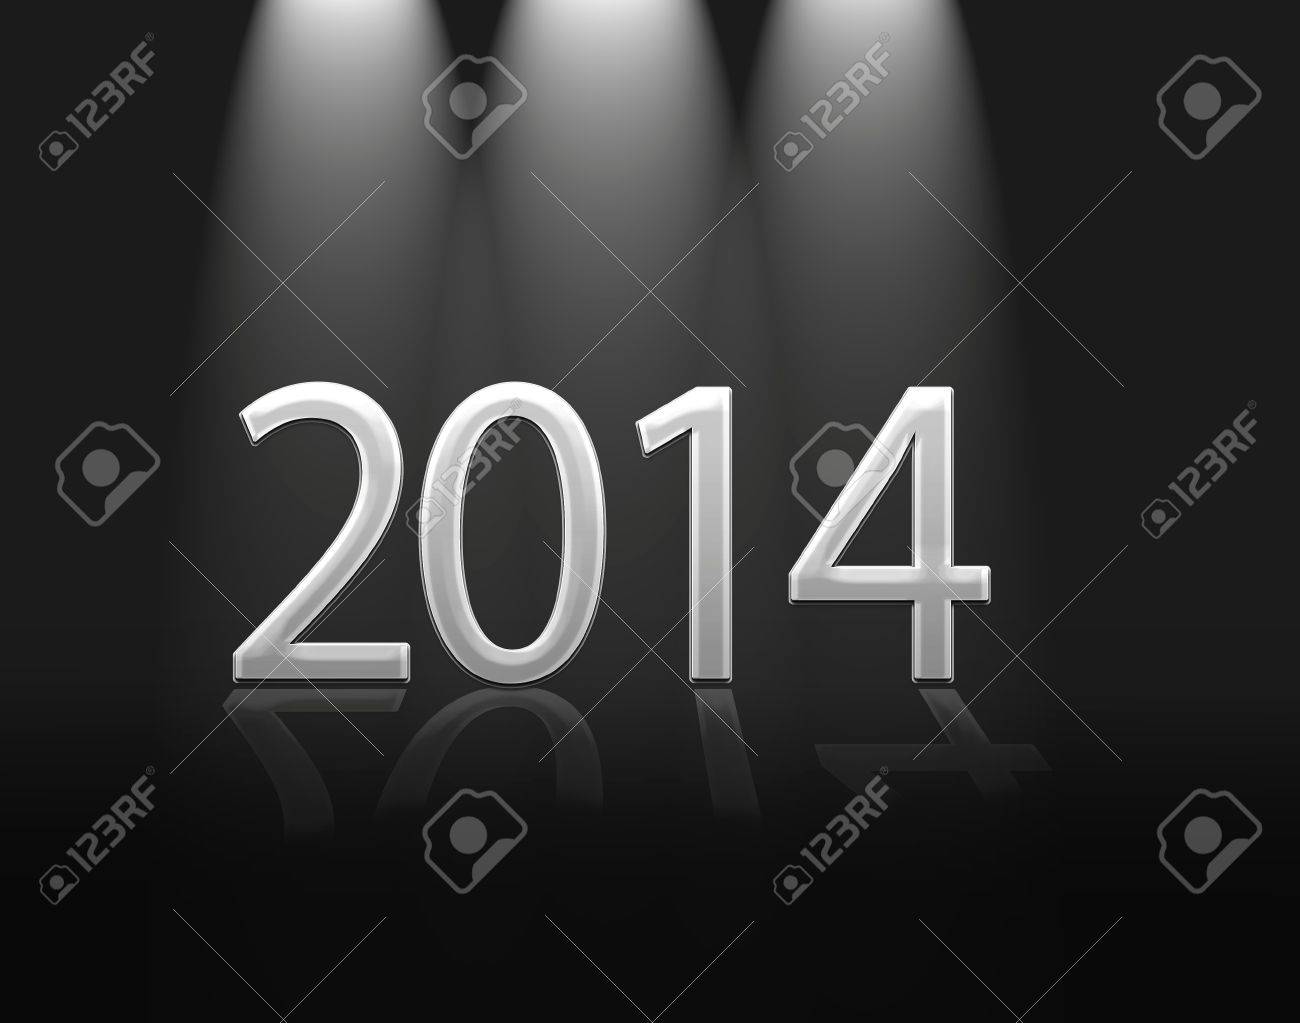 Illustration with a metal sign  calendar 2014 Stock Illustration - 22882957